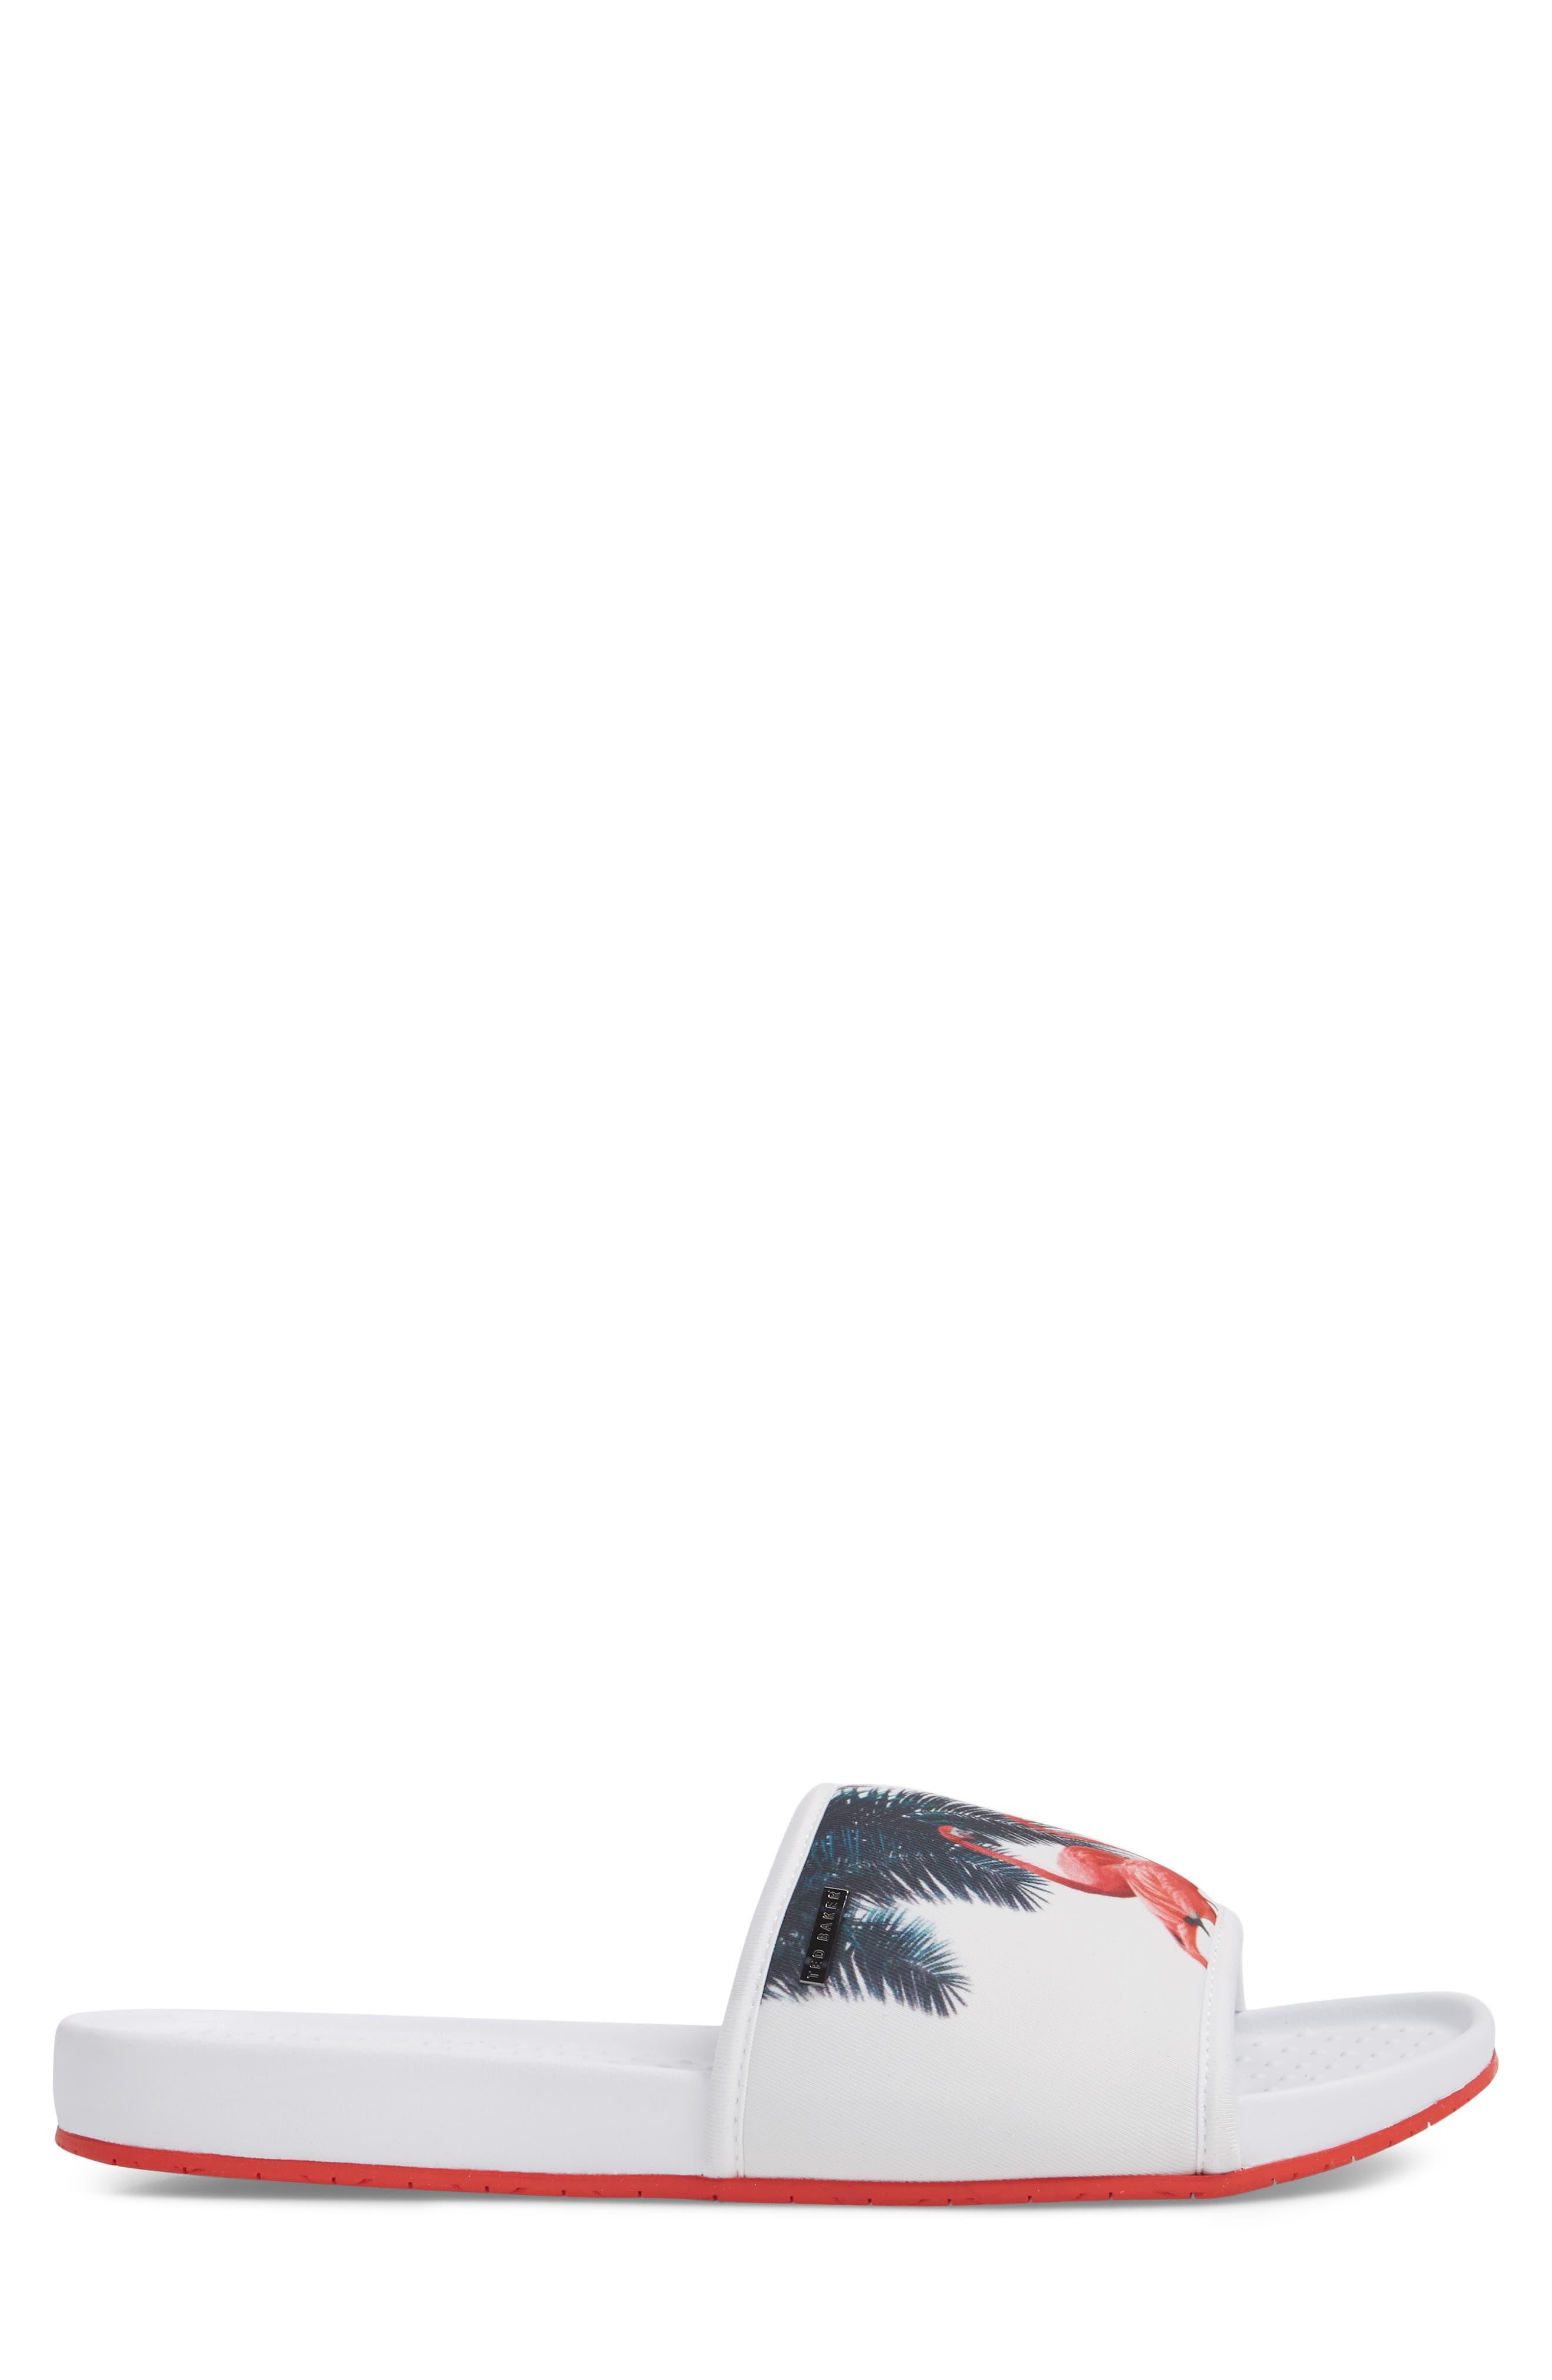 Sauldi 2 Slide Sandal,                             Alternate thumbnail 3, color,                             White/ Red Textile